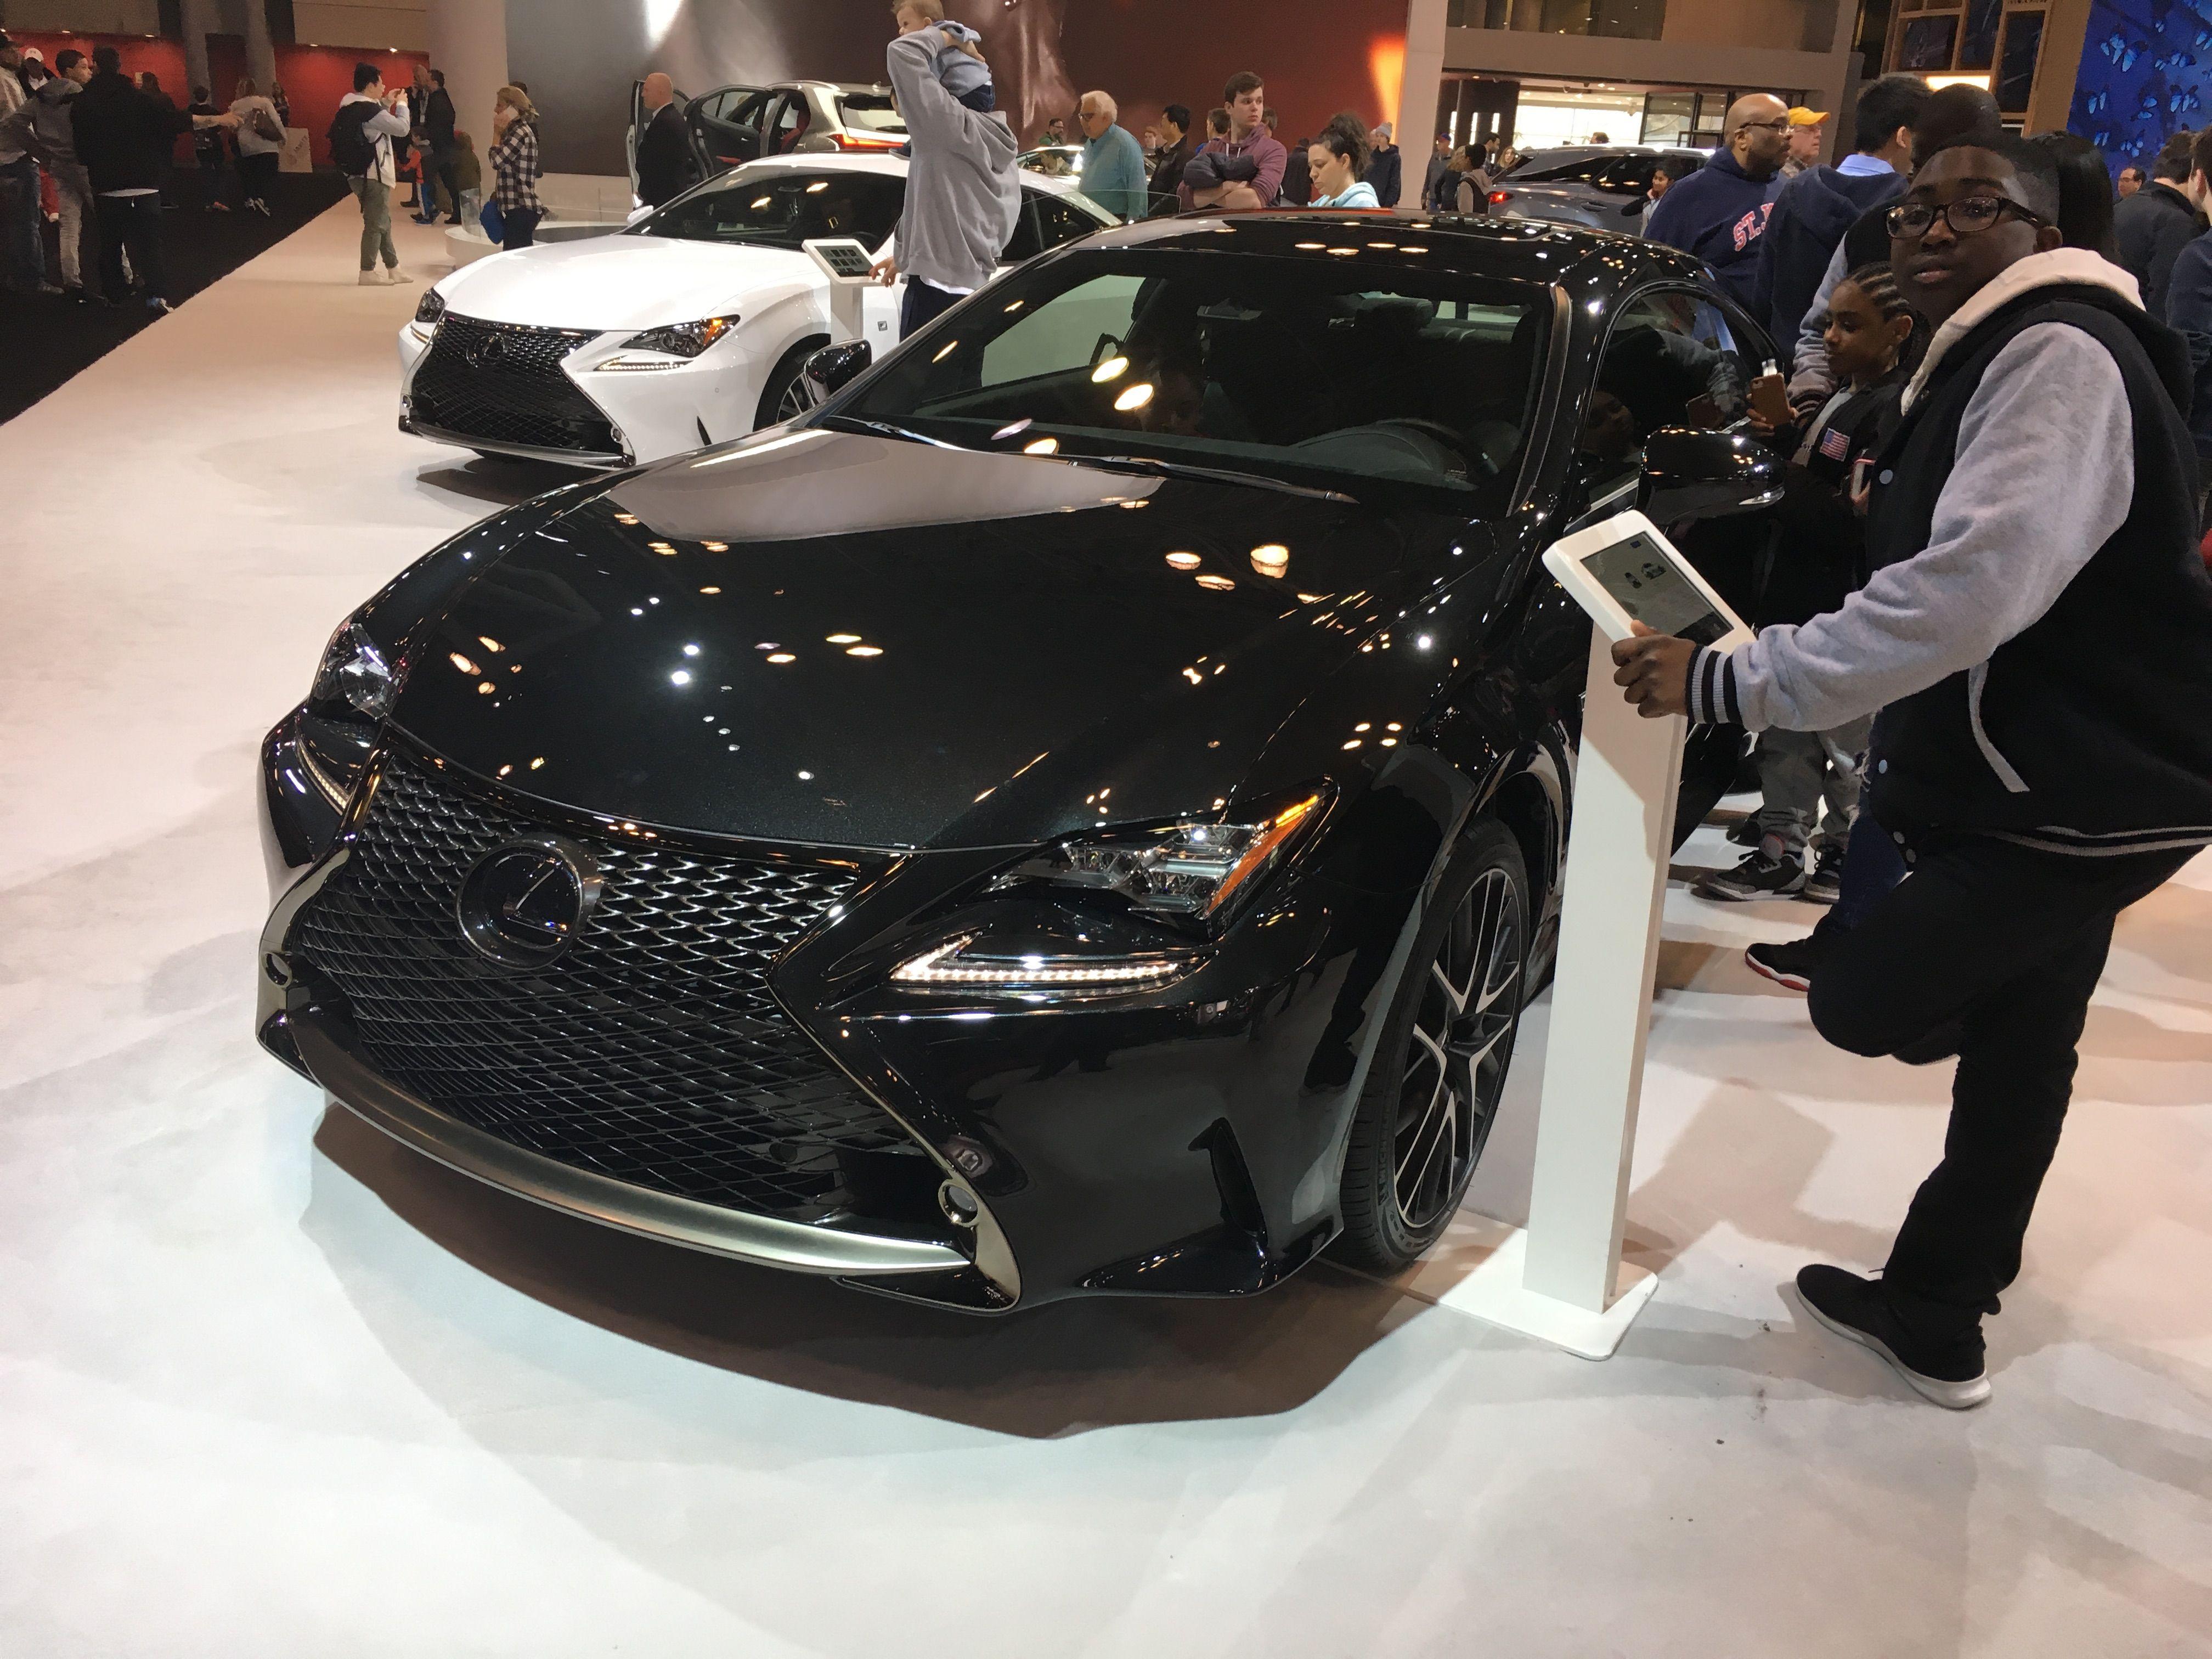 2019 Lexus Rc F Sport Black Line Lexus Sports Luxury Branding 2018 lexus rc 350 f sport black